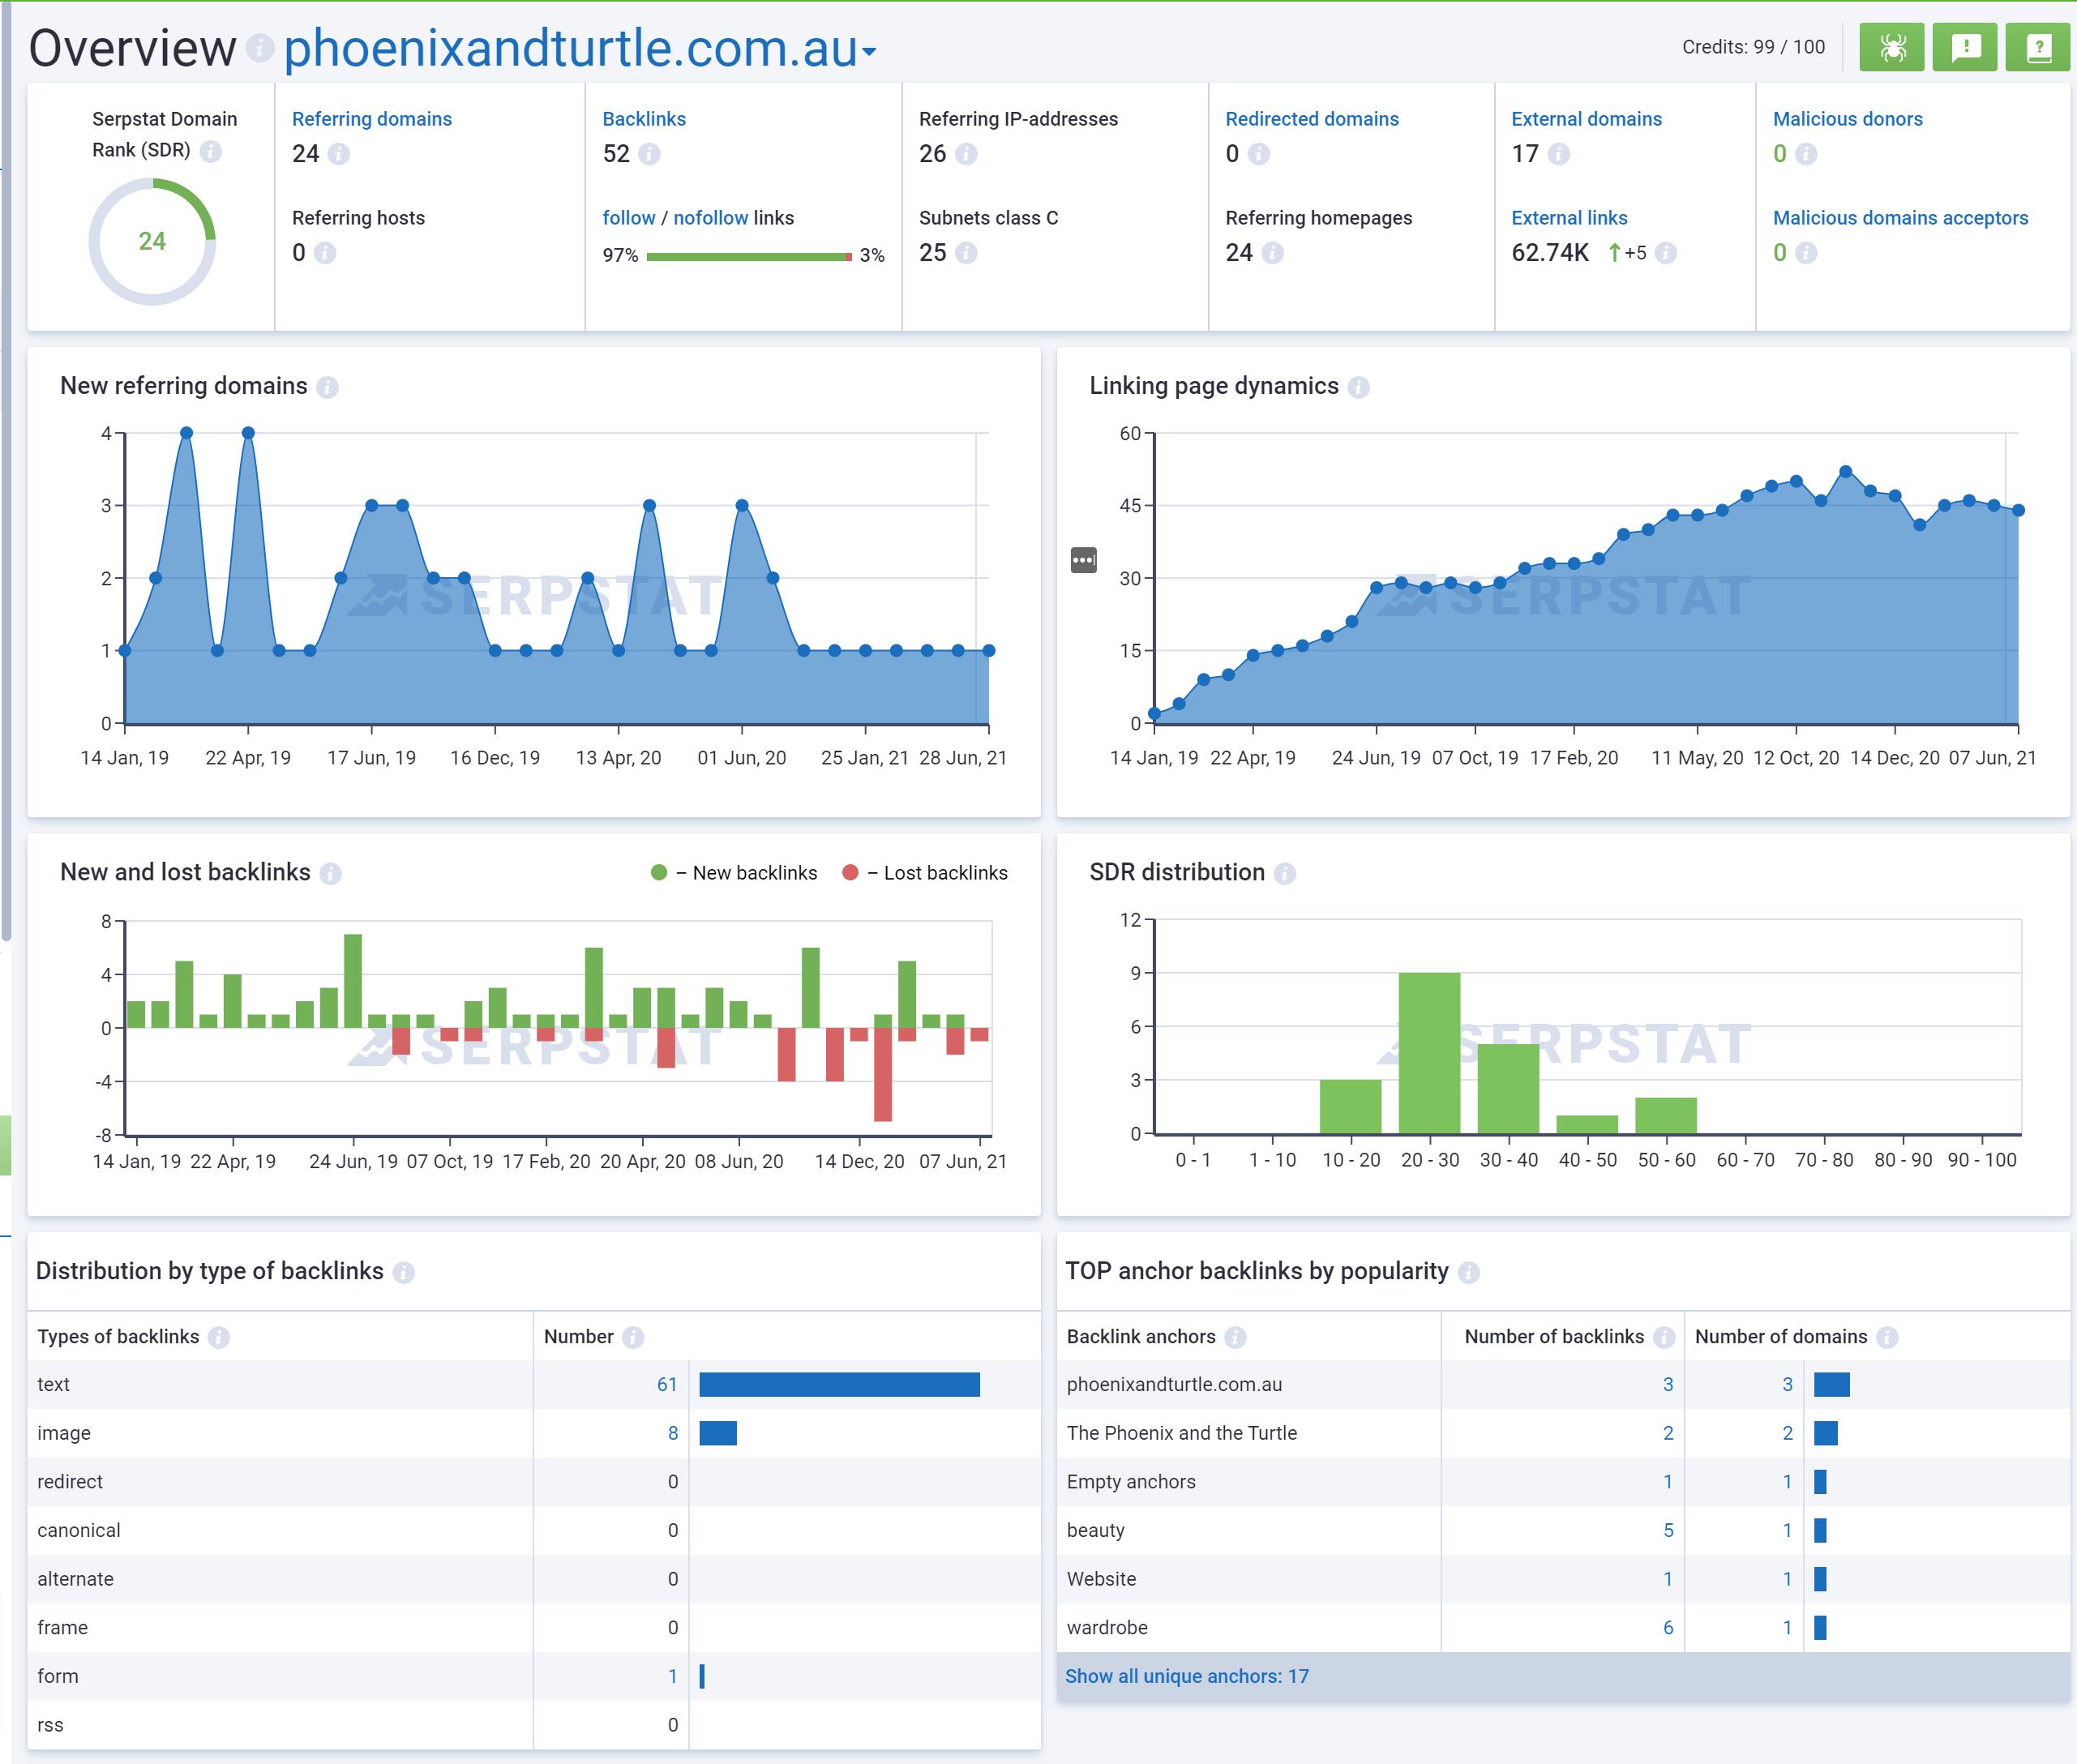 Overview Backlink Analysis serpstat